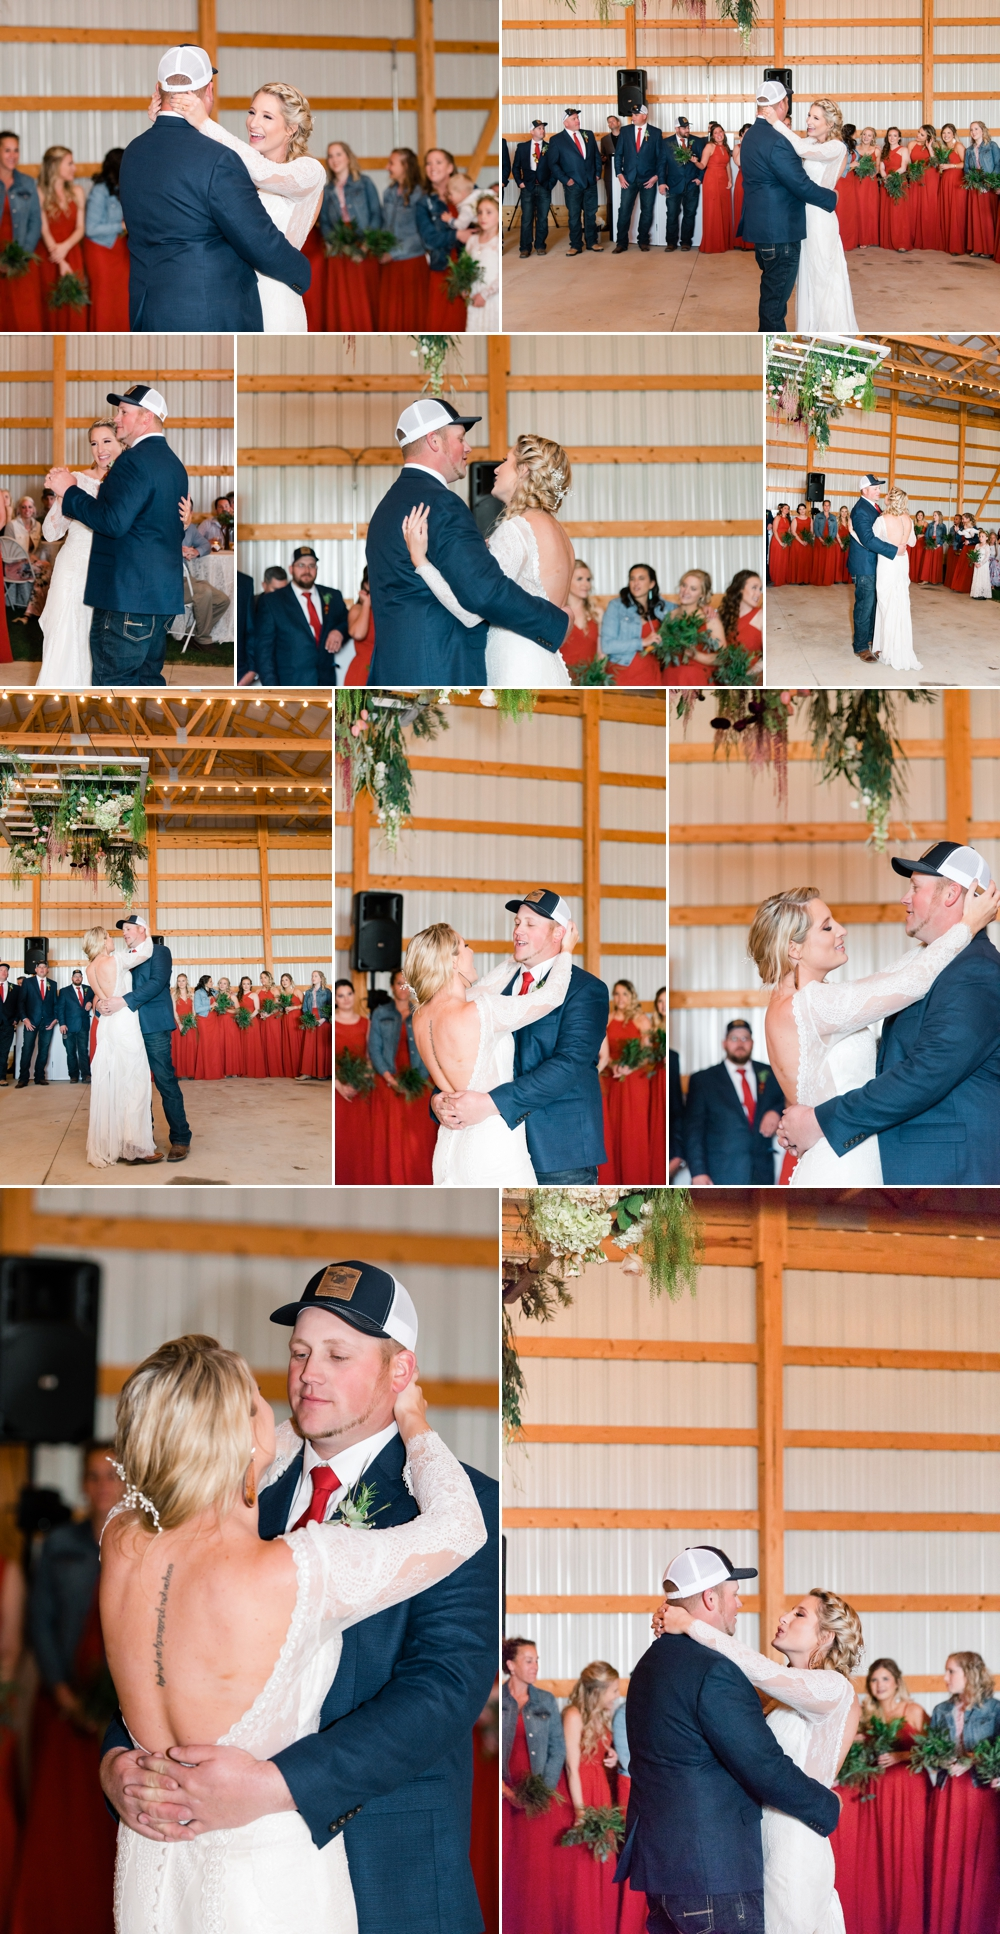 sickler wedding 22.jpg